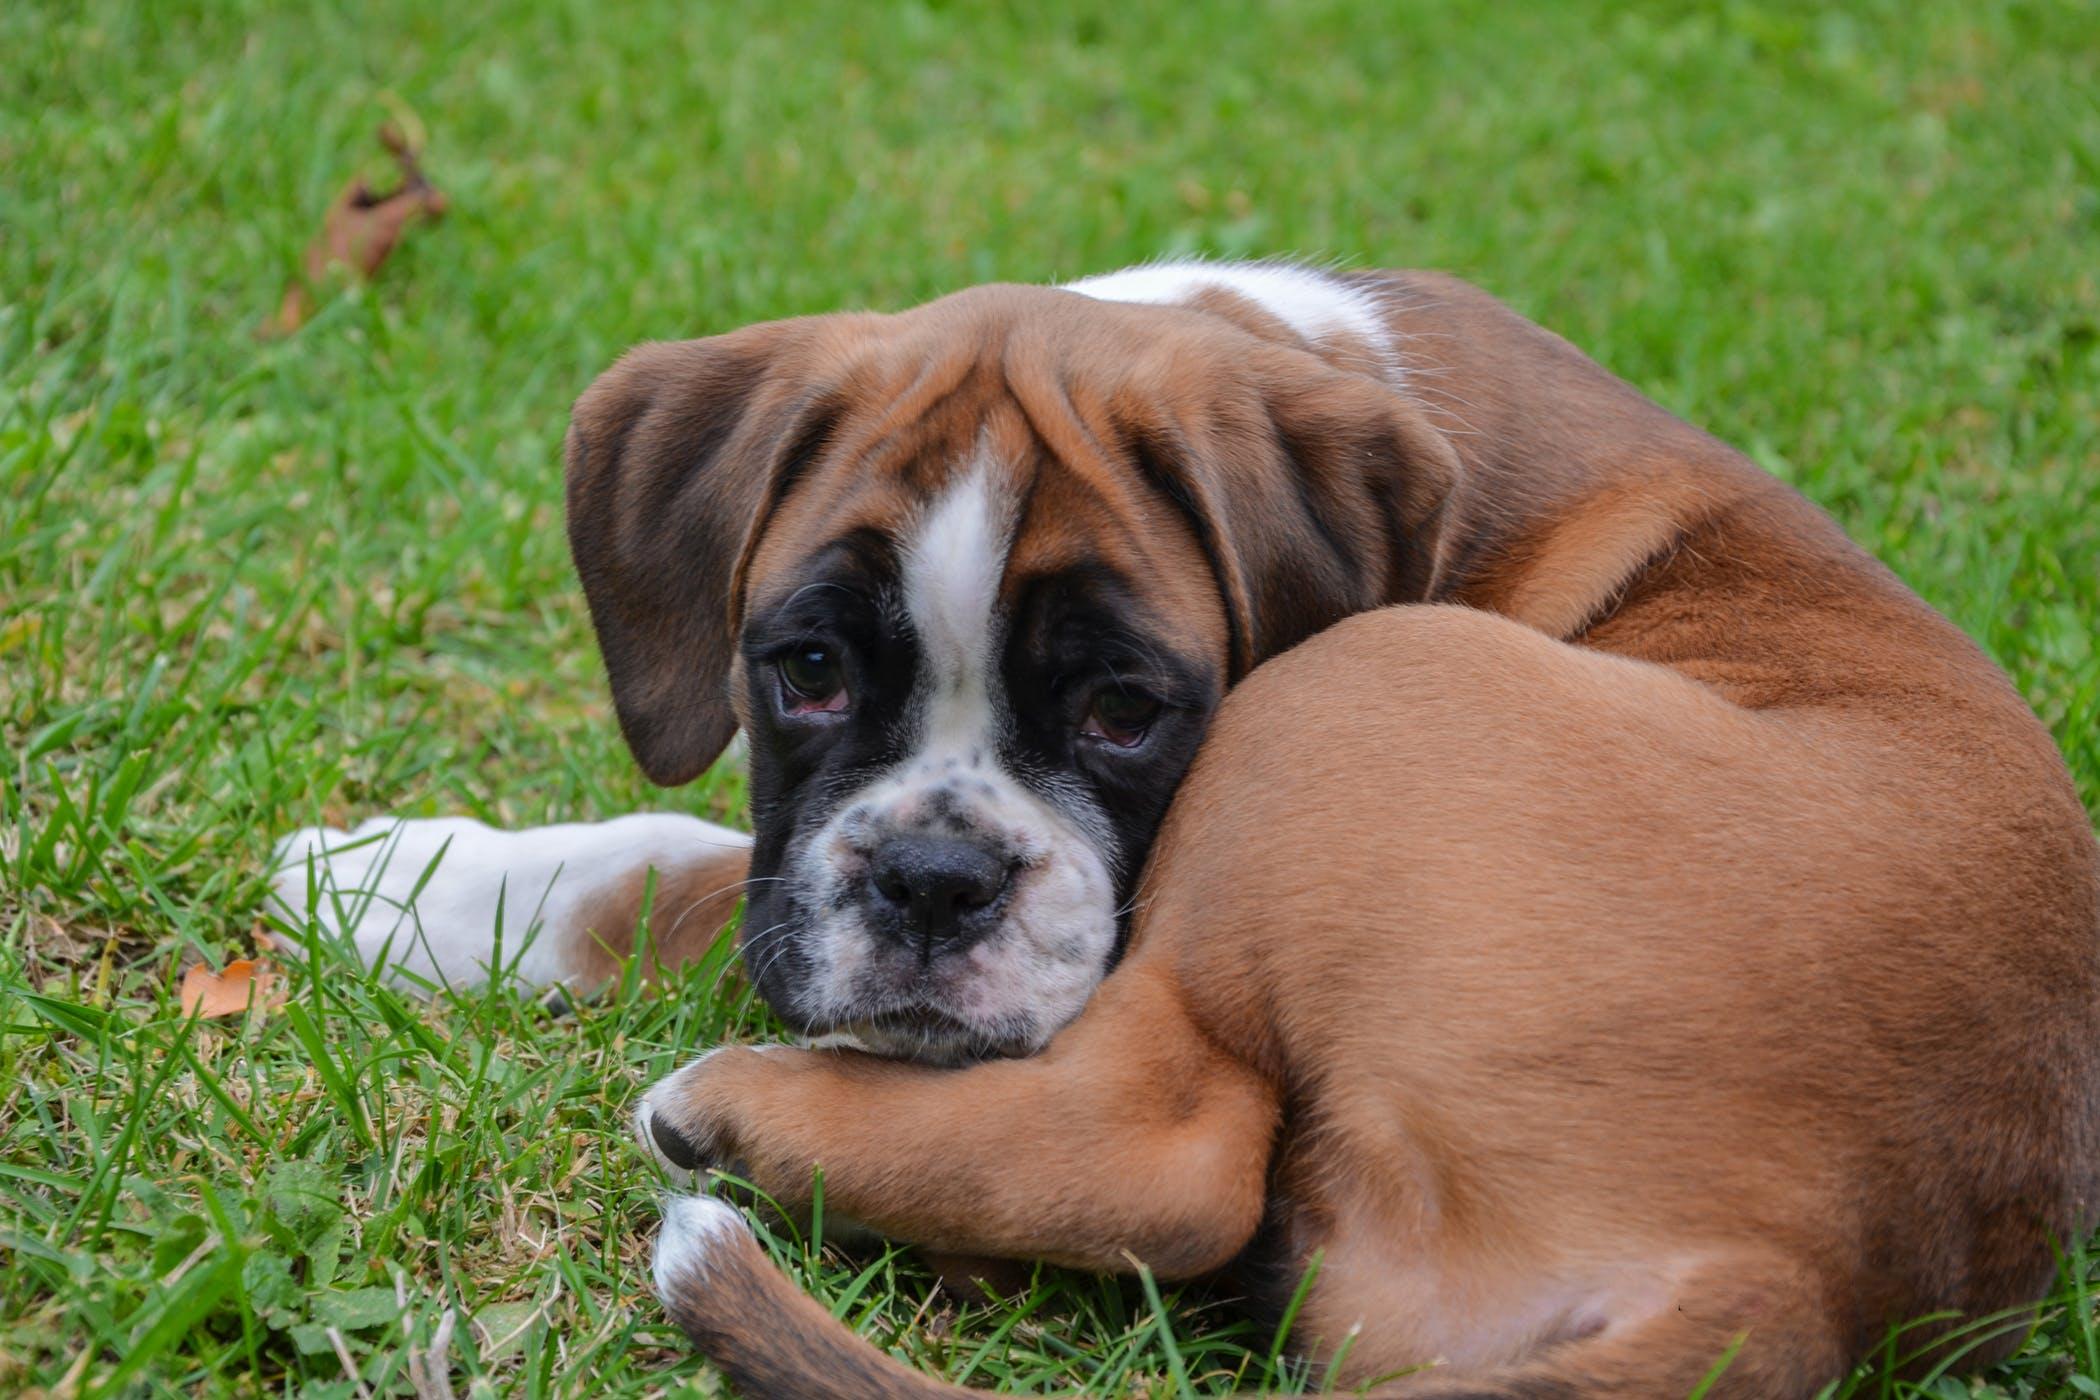 Repair Musculotendon Rupture in Dogs